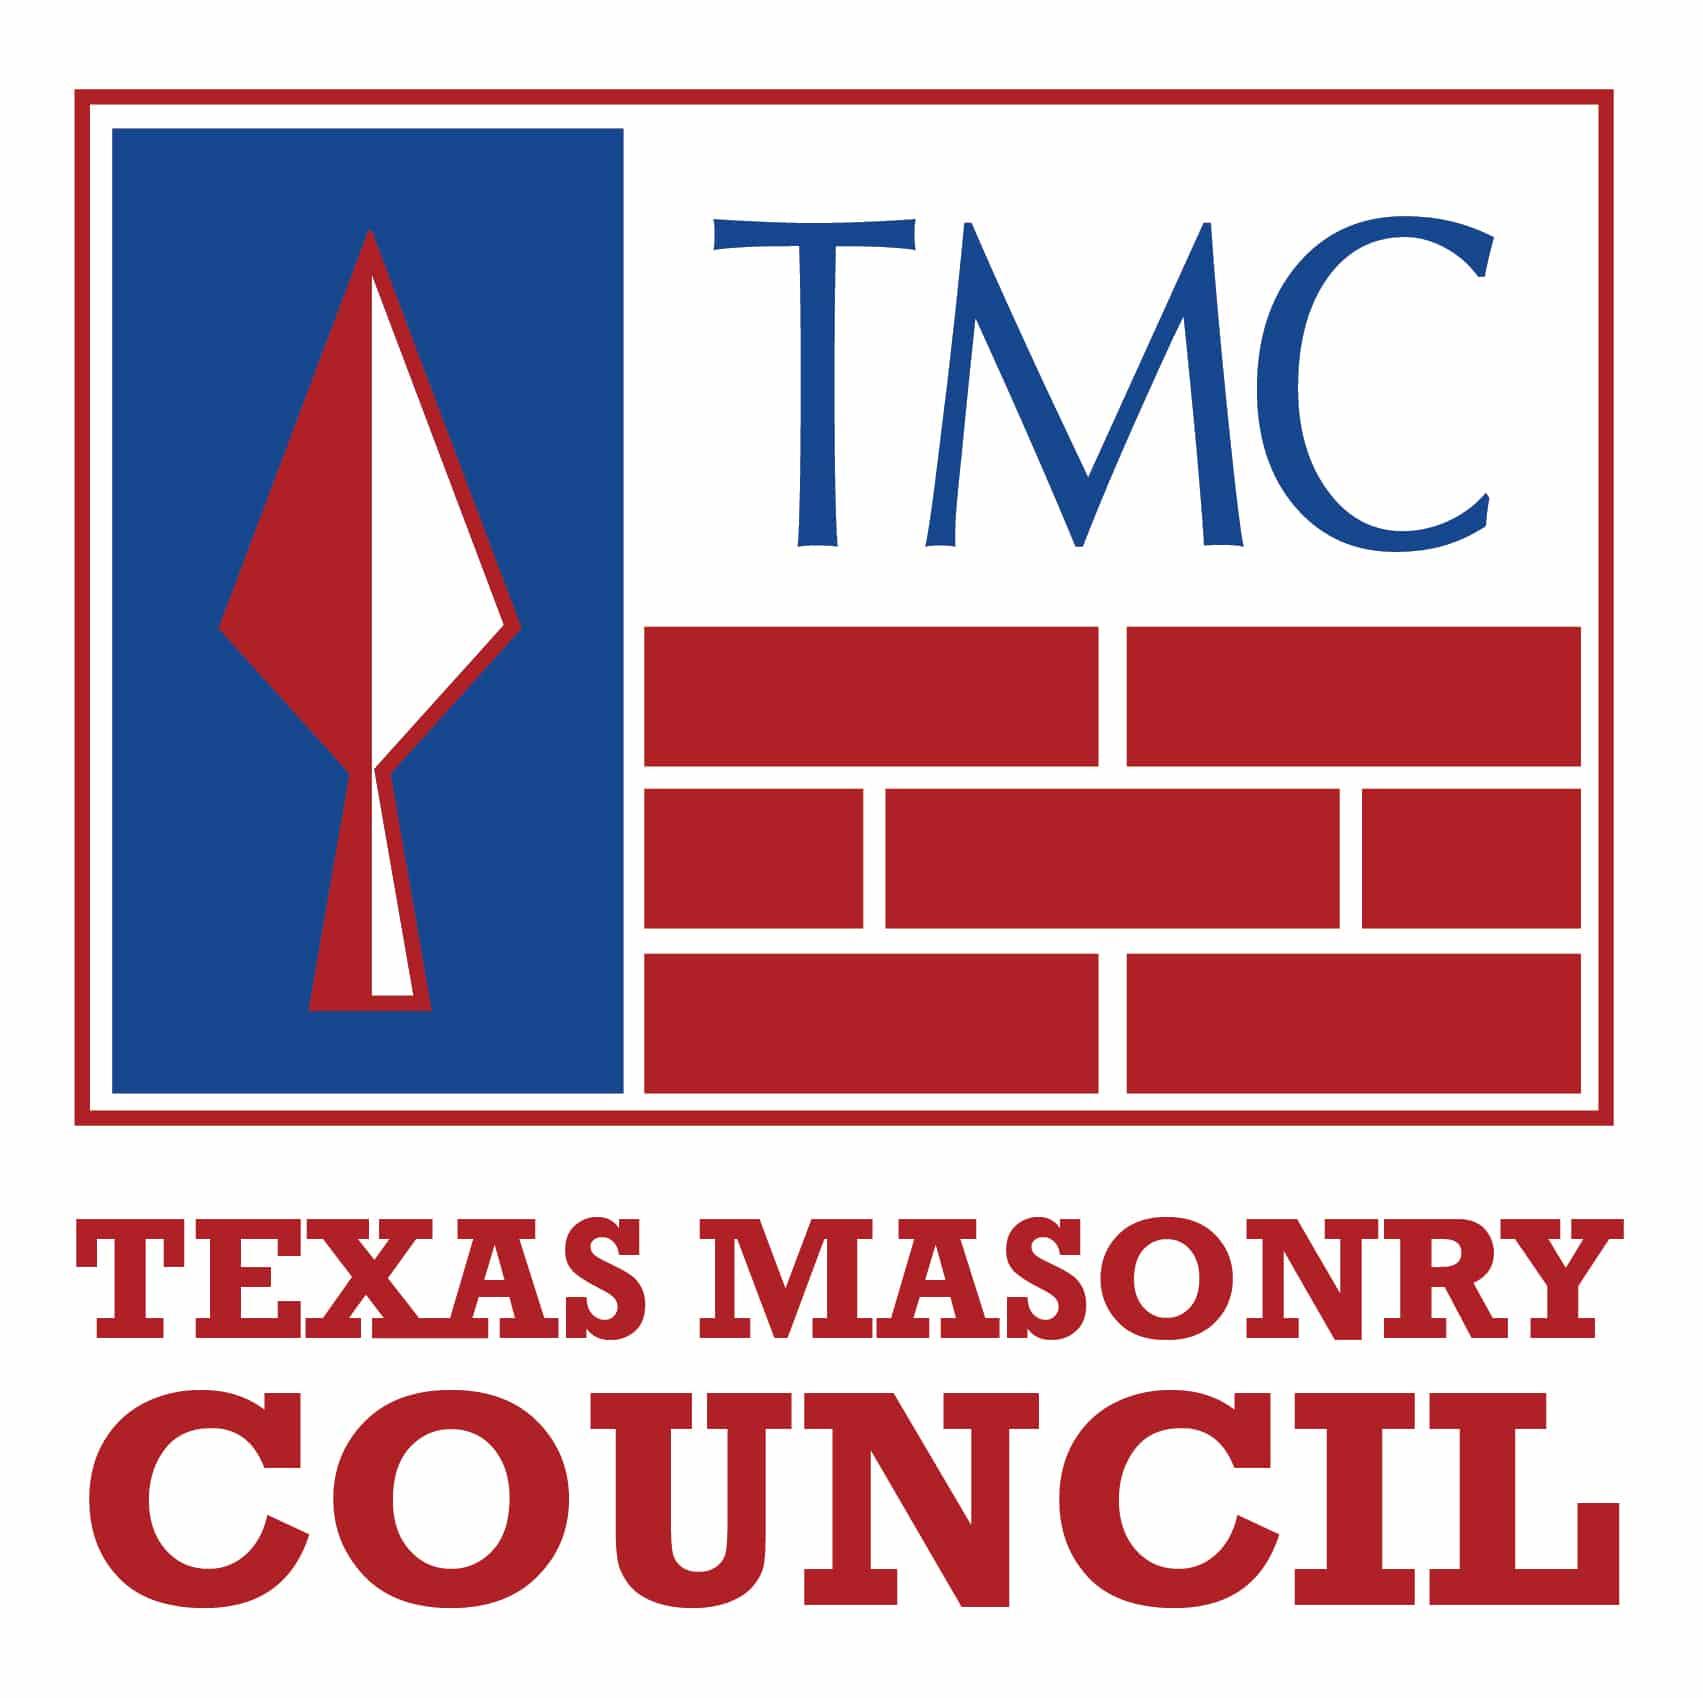 Texas masonry council ad